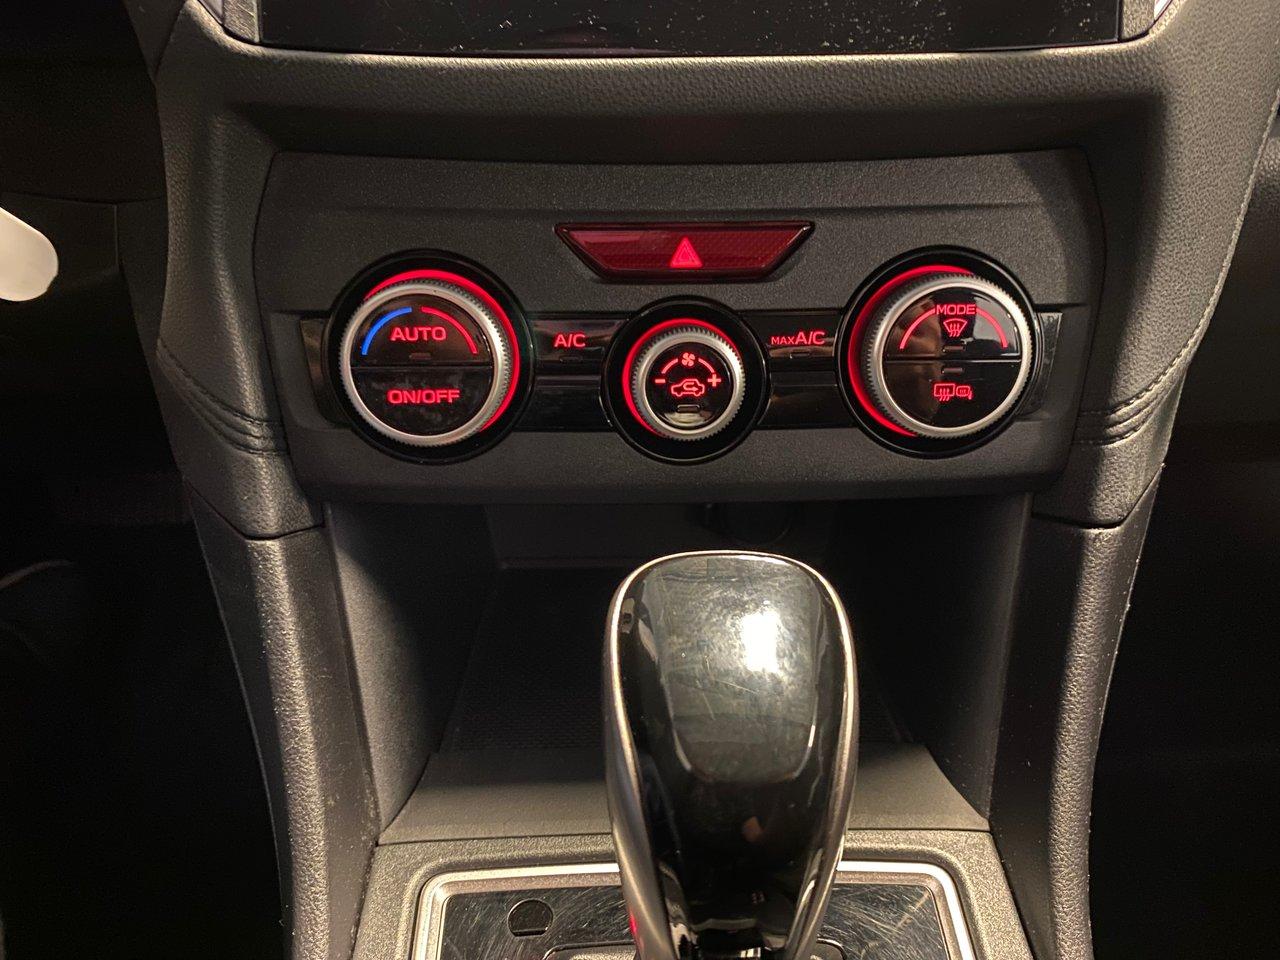 2019 Subaru Impreza TOURING 2.0L AWD